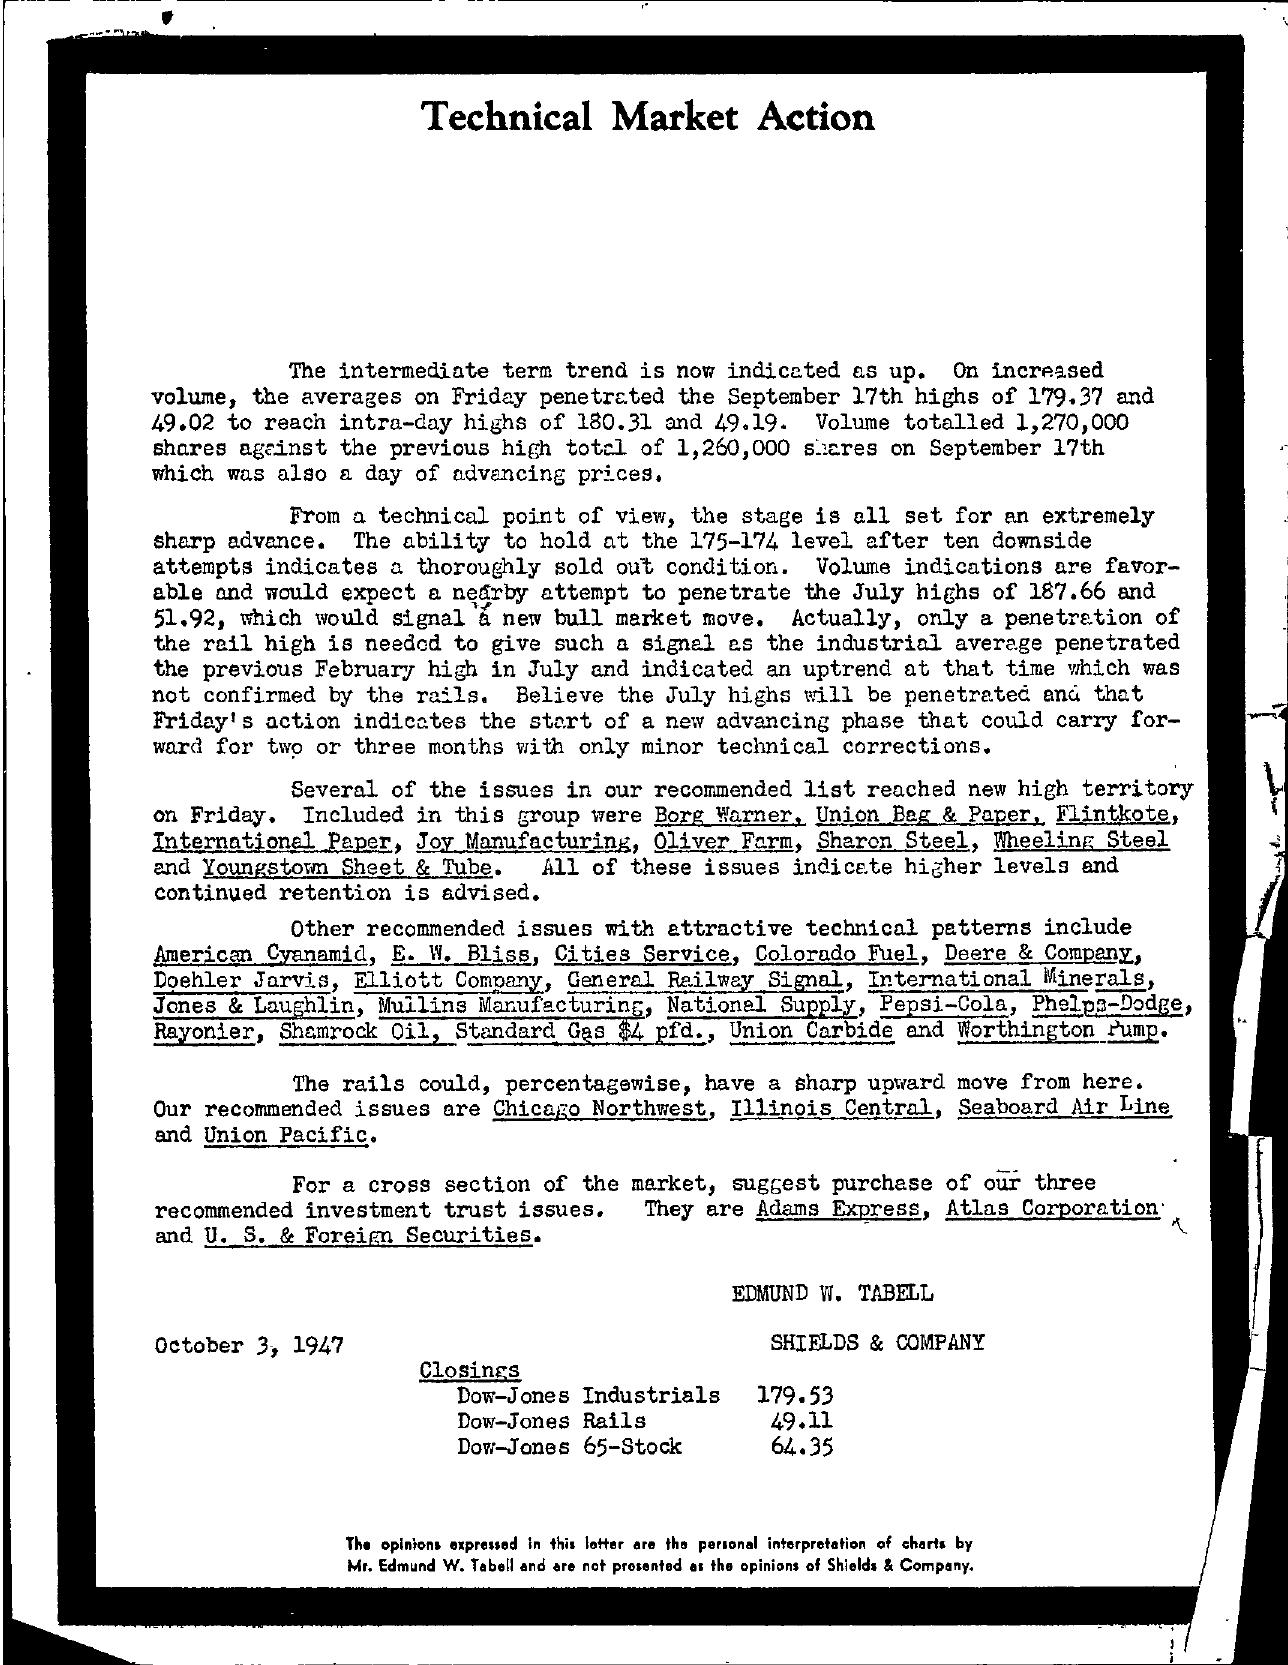 Tabell's Market Letter - October 03, 1947